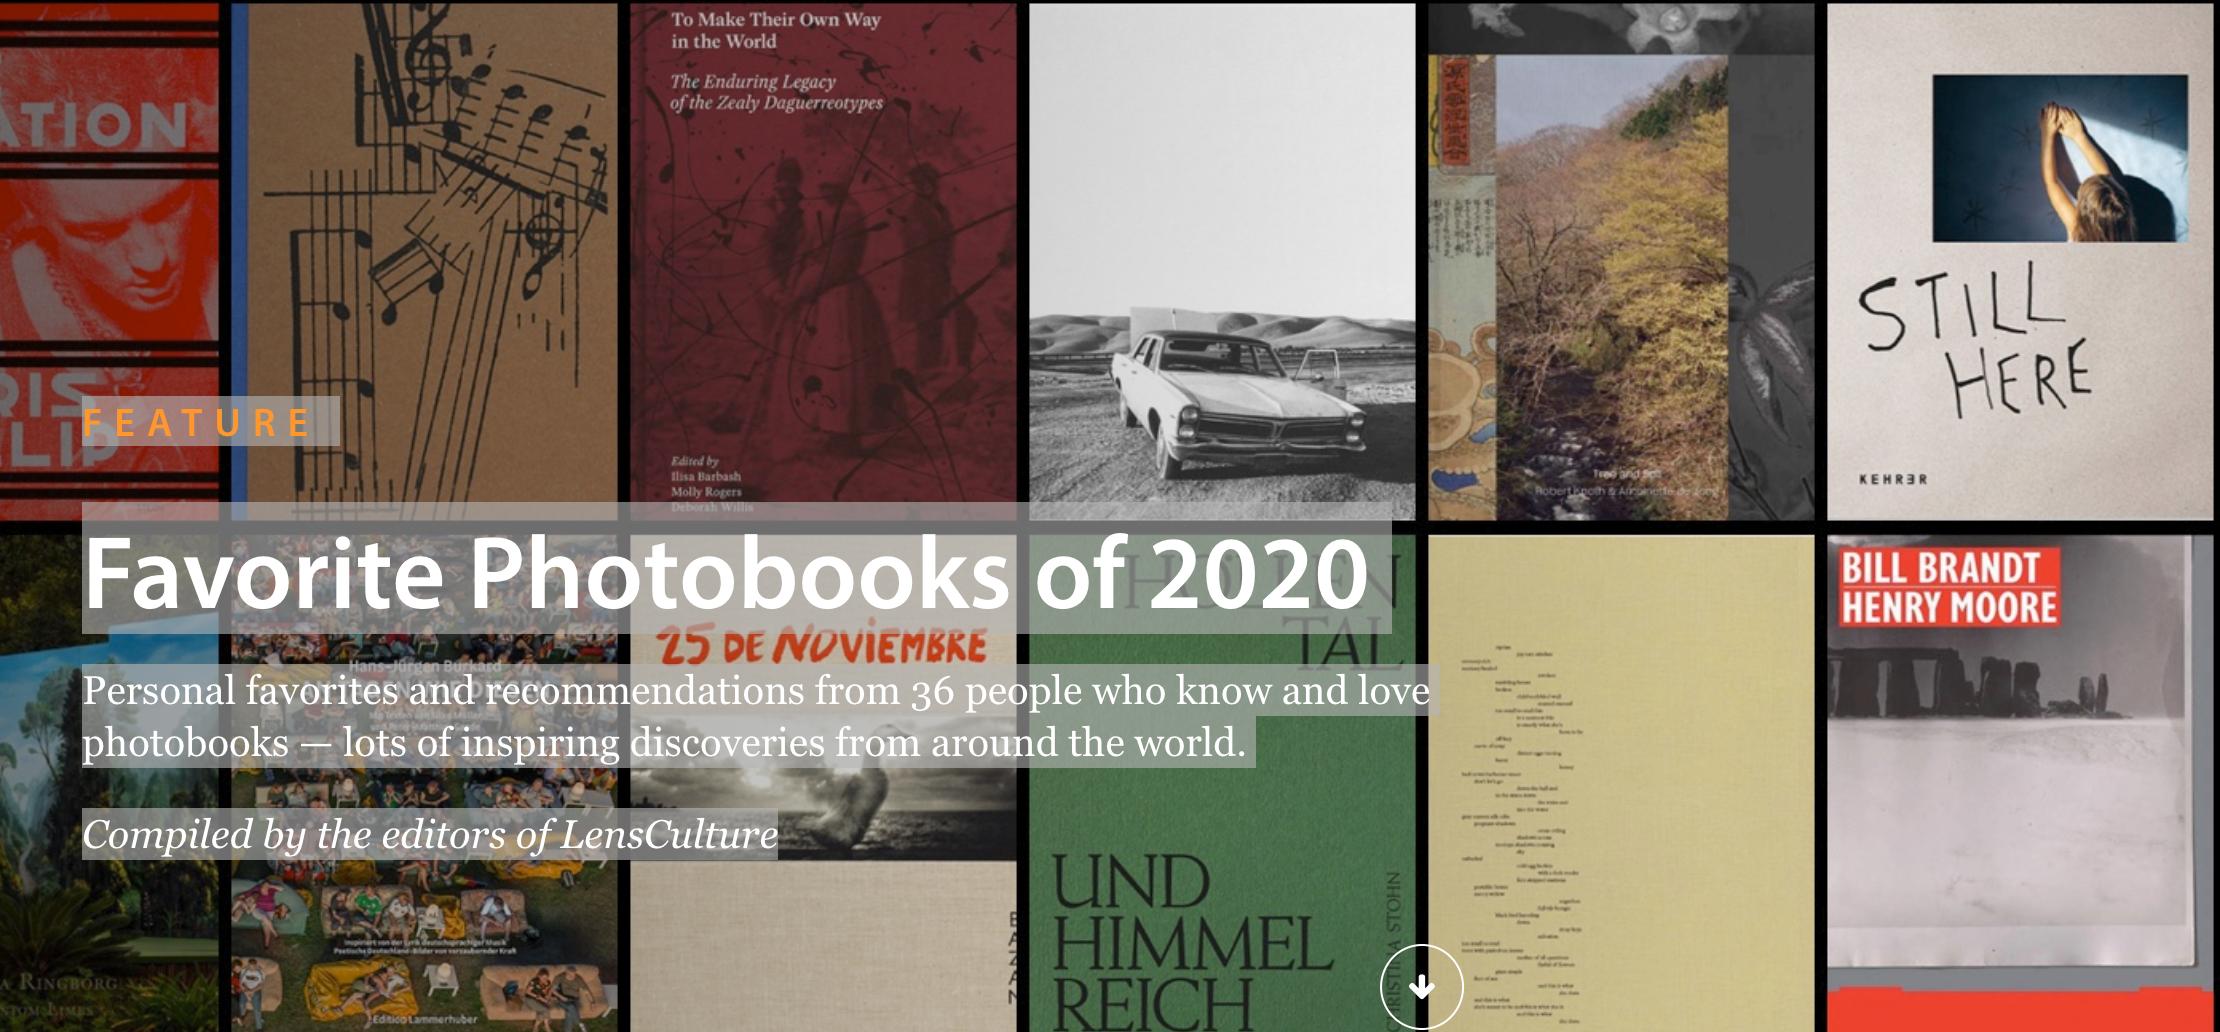 lensculture_favoritephotobooks2020